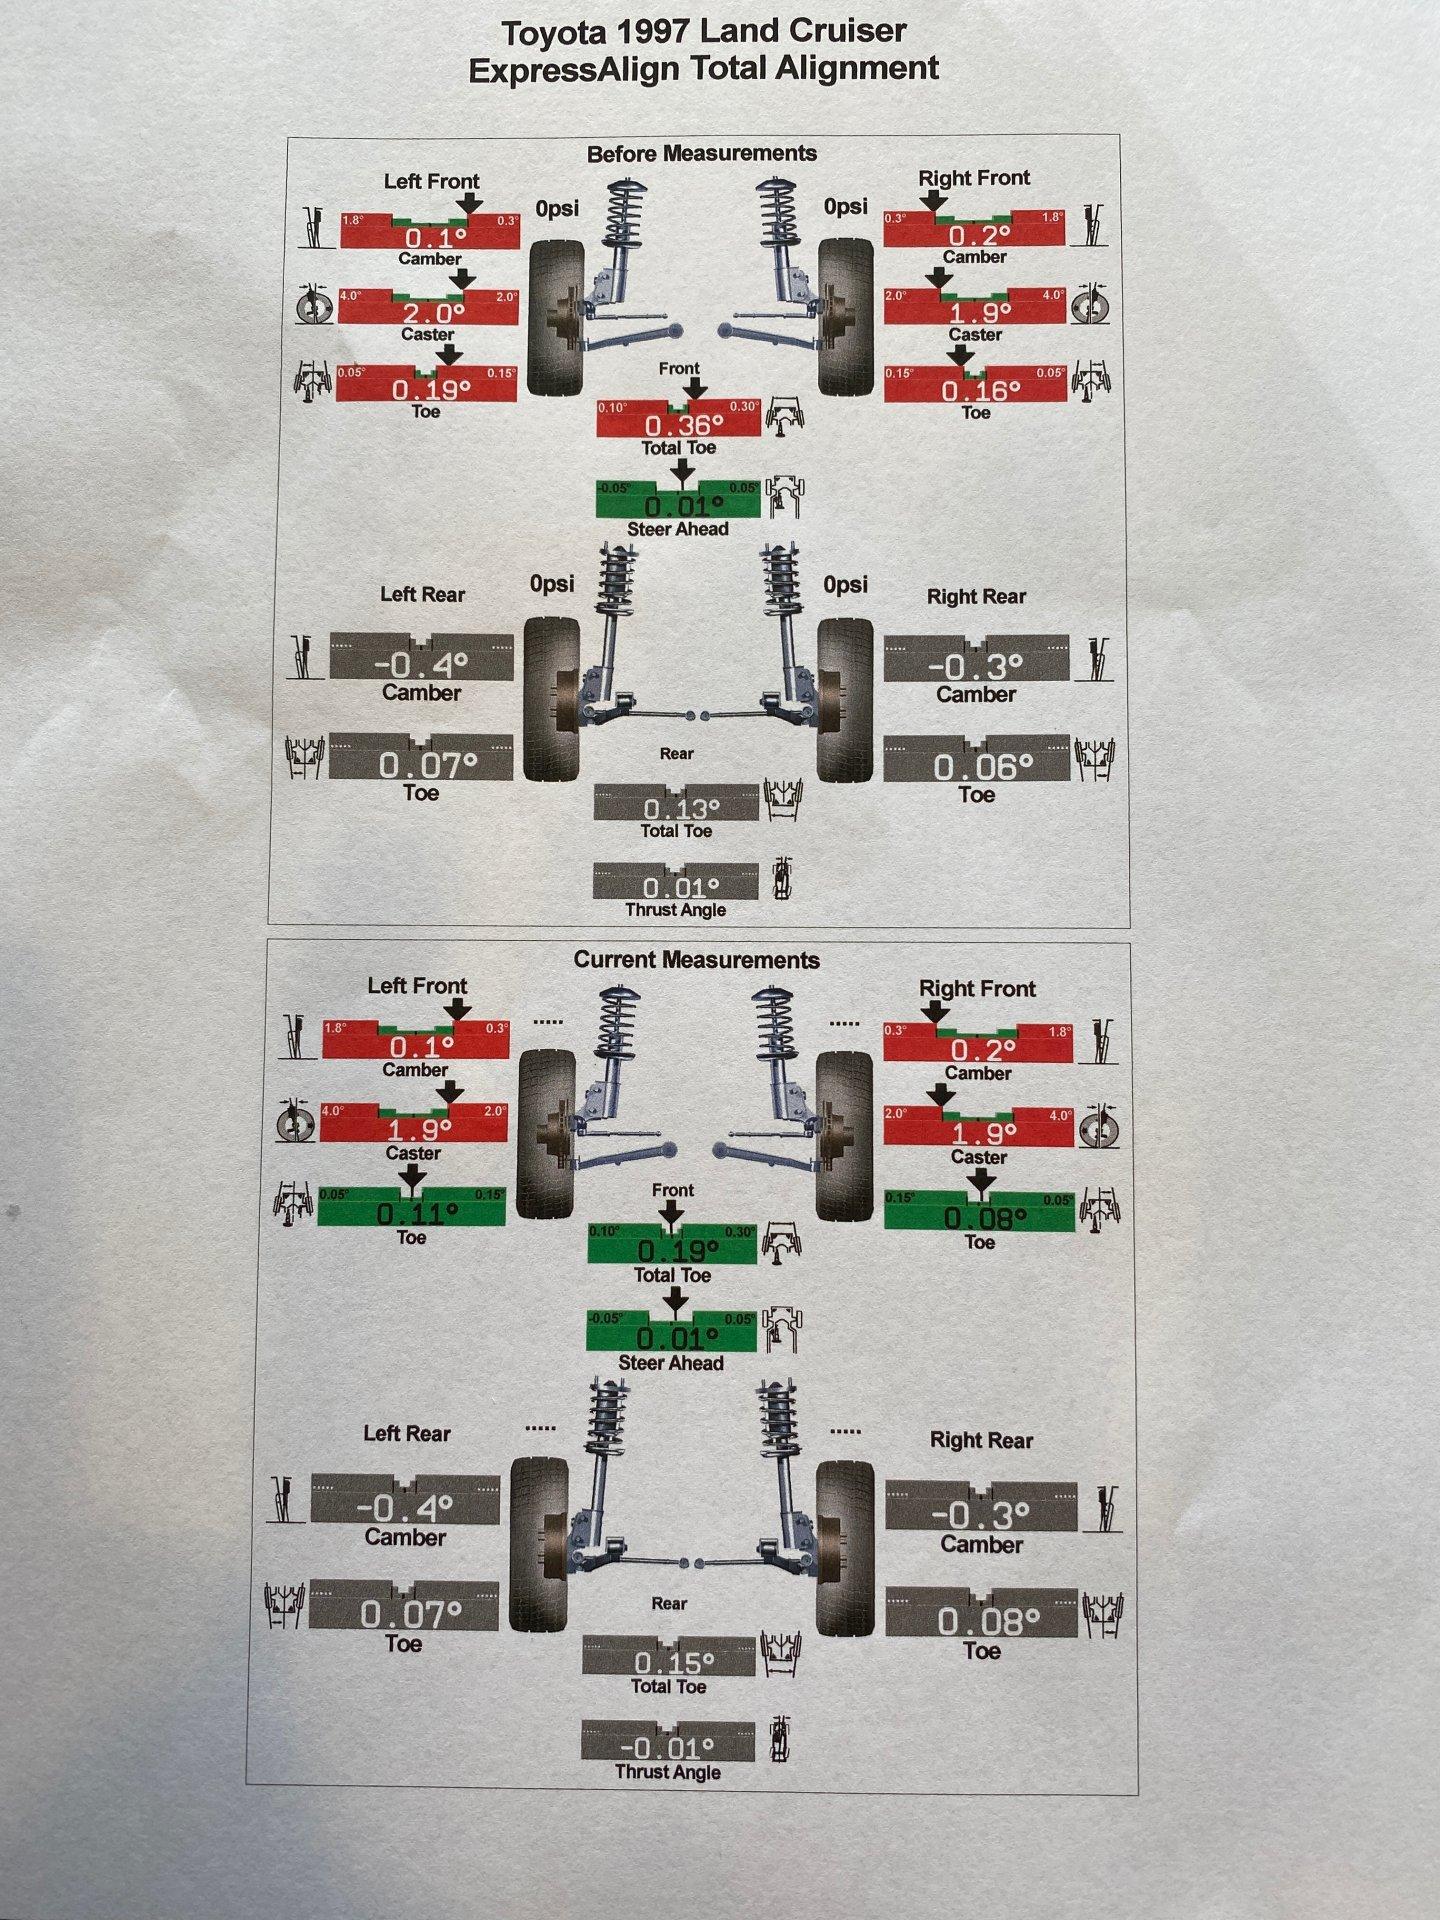 4AB12541-A265-40C0-80DF-4E41160D3572.jpeg